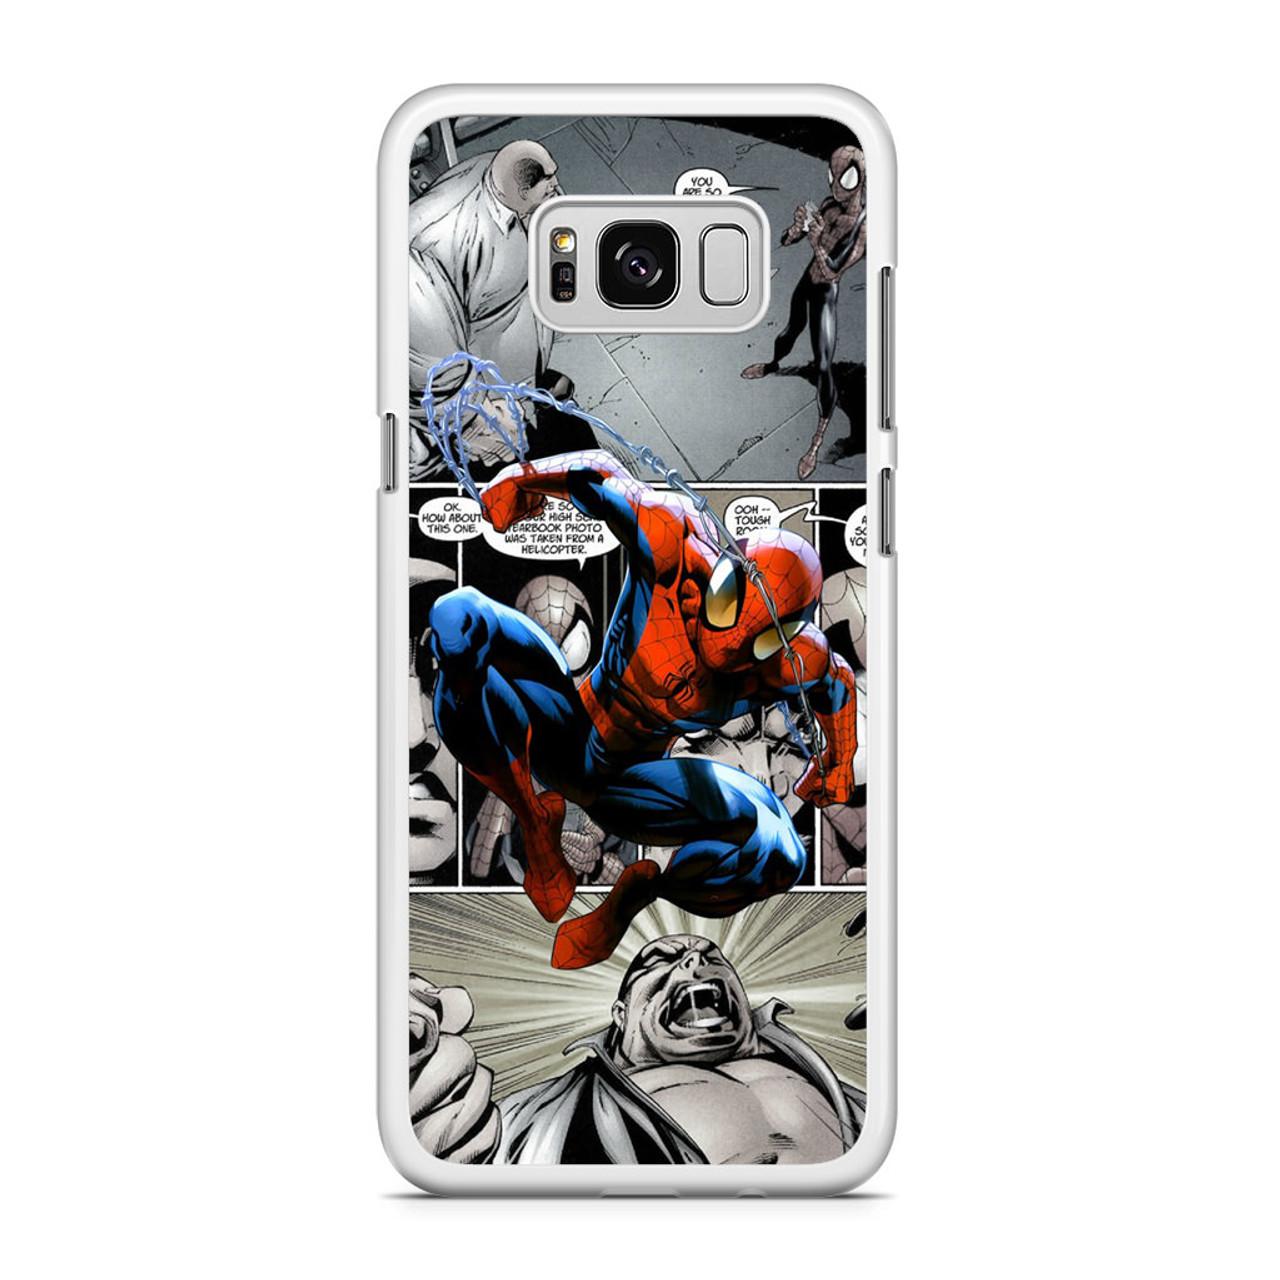 Spiderman Comics Wallpaper Samsung Galaxy S8 Case Caseshunter